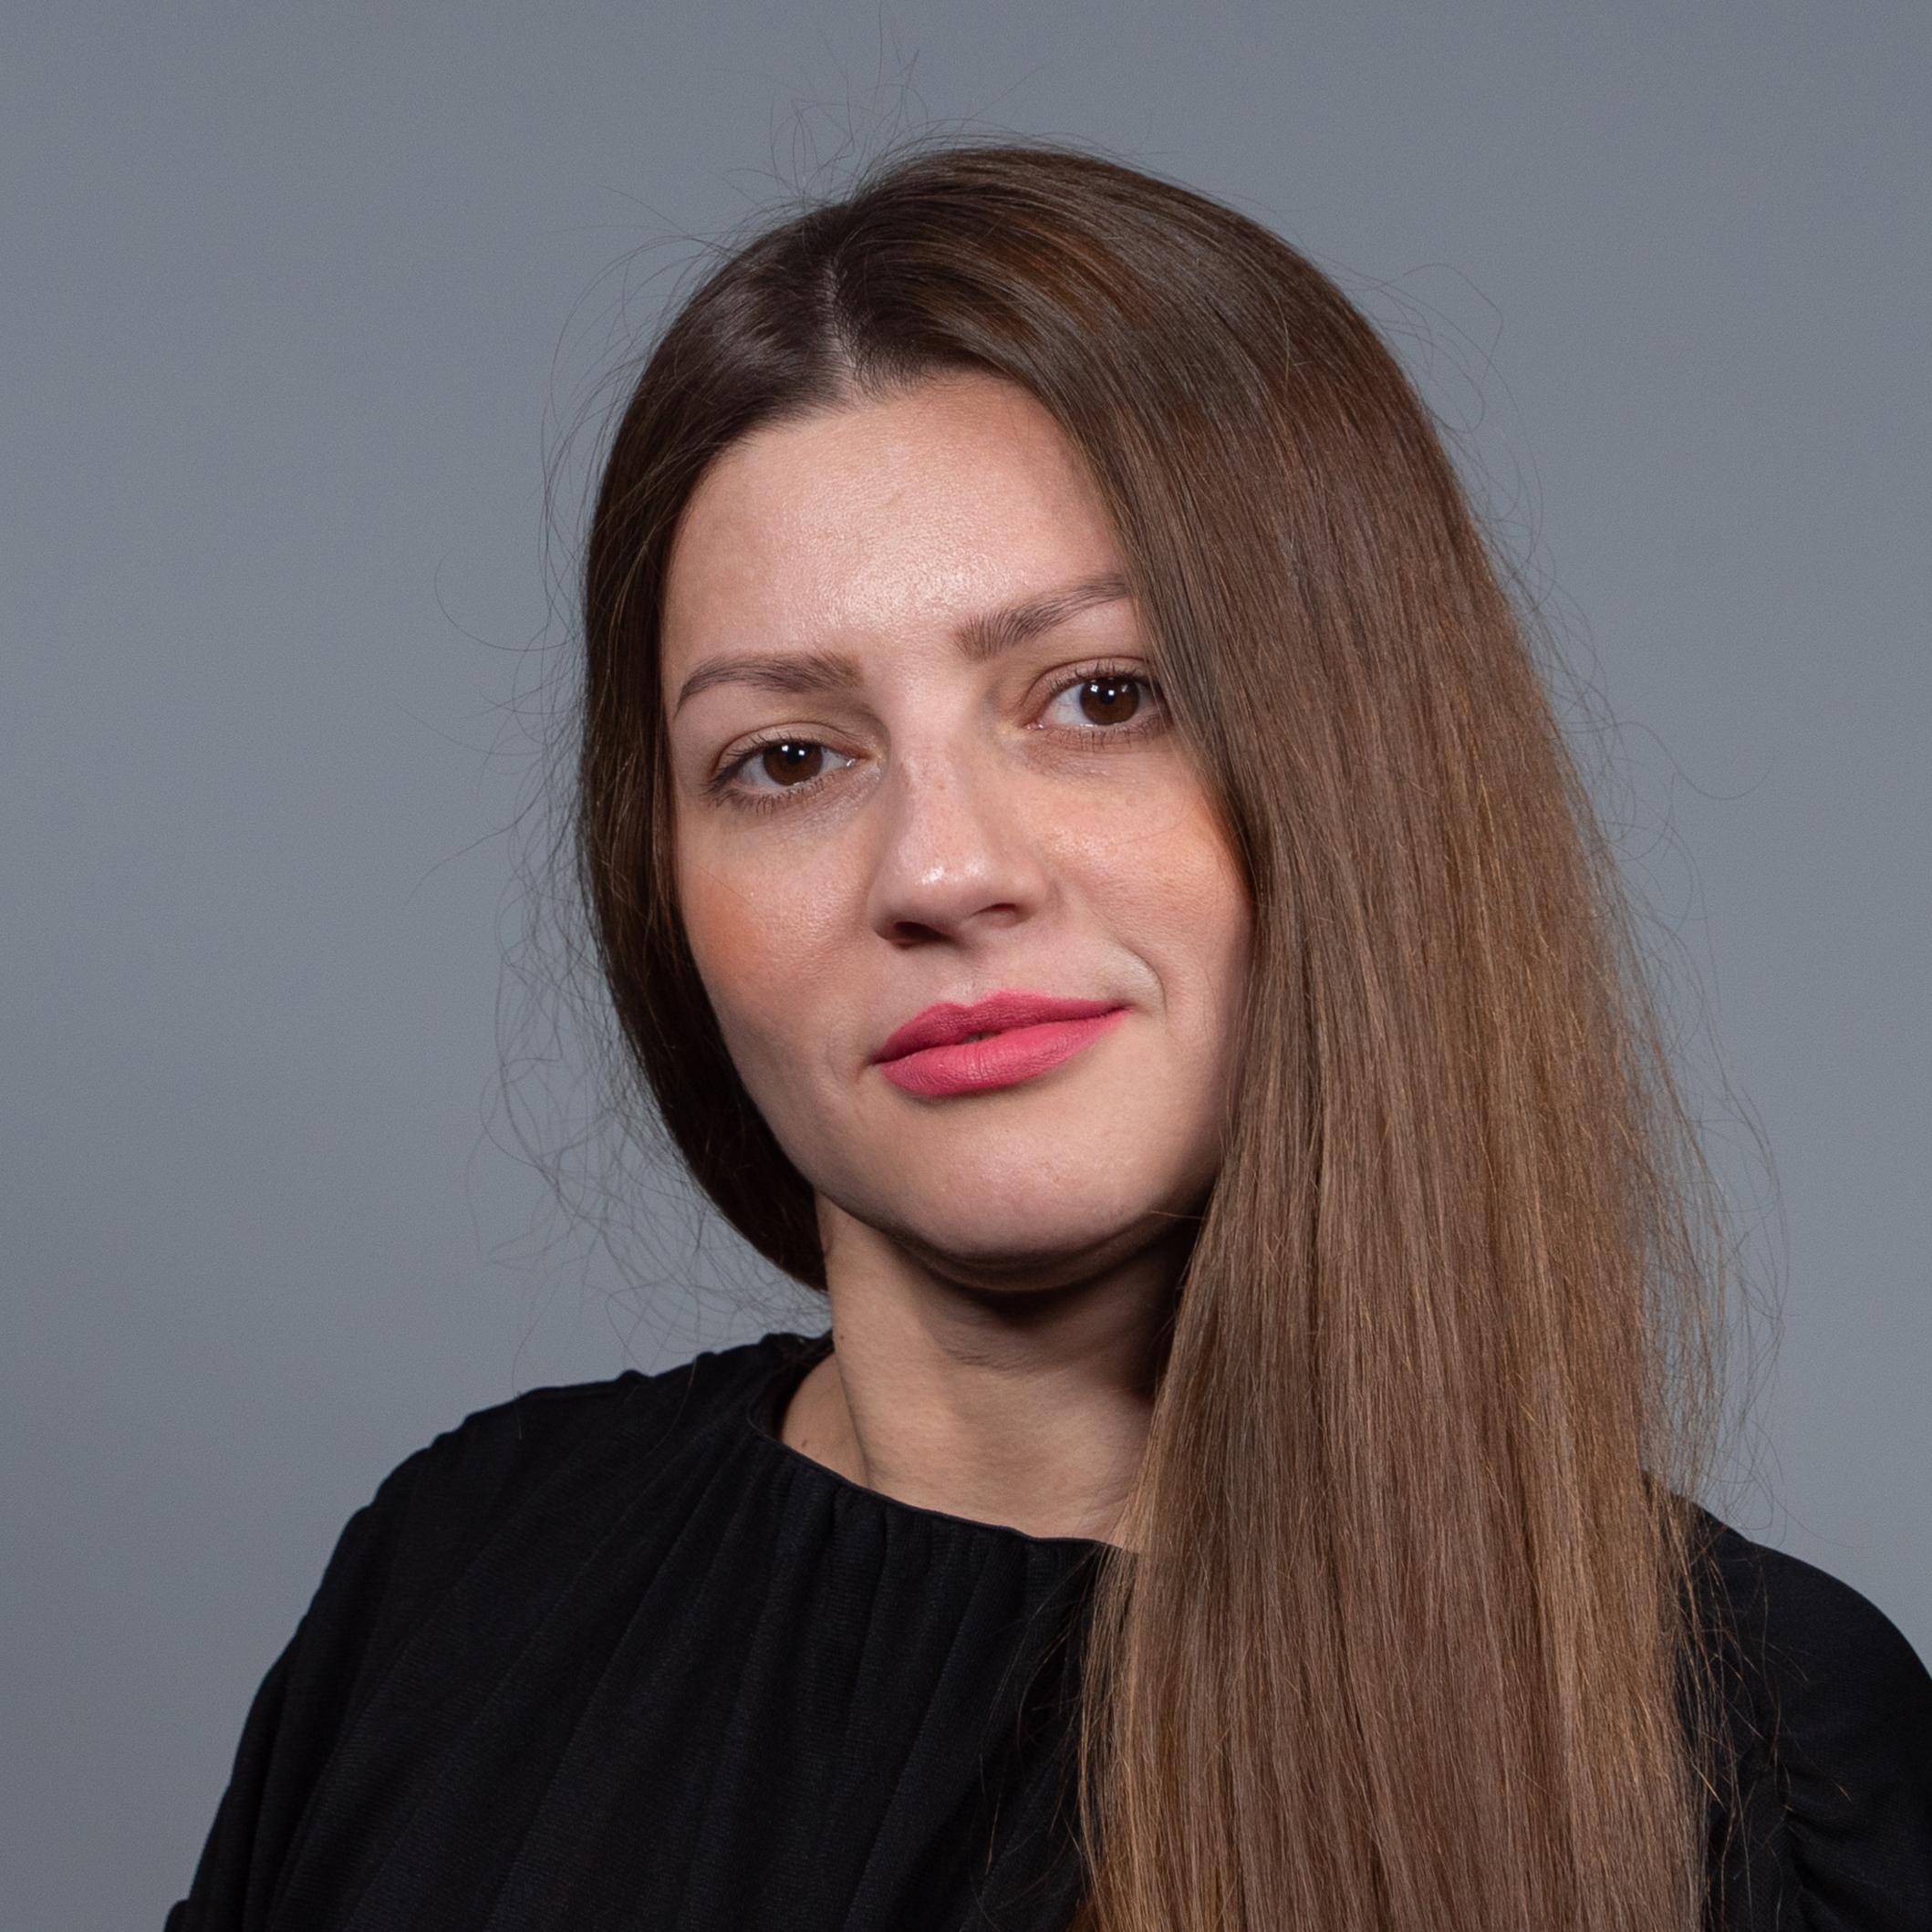 Кучеренко Ирина Викторовна